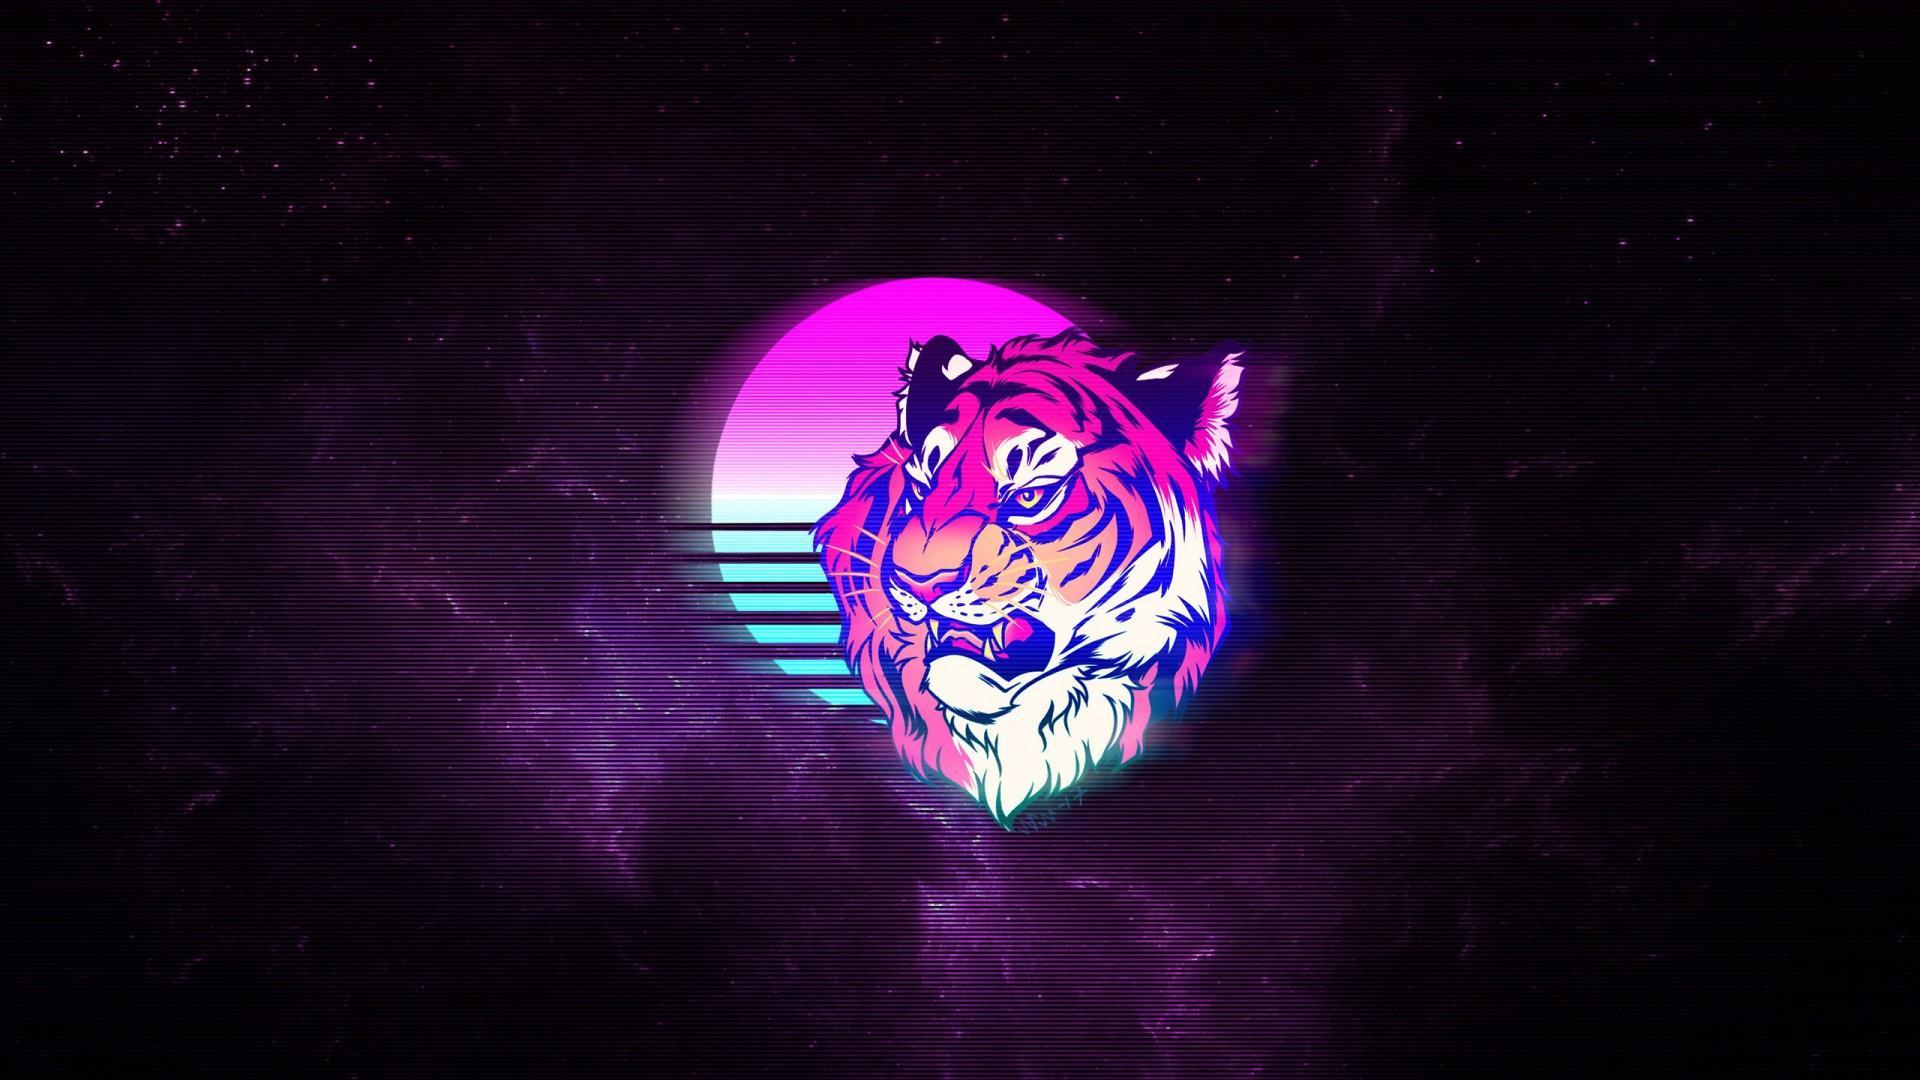 Tiger Retro Neon Art Wallpapers Hd Wallpapers Id 29165